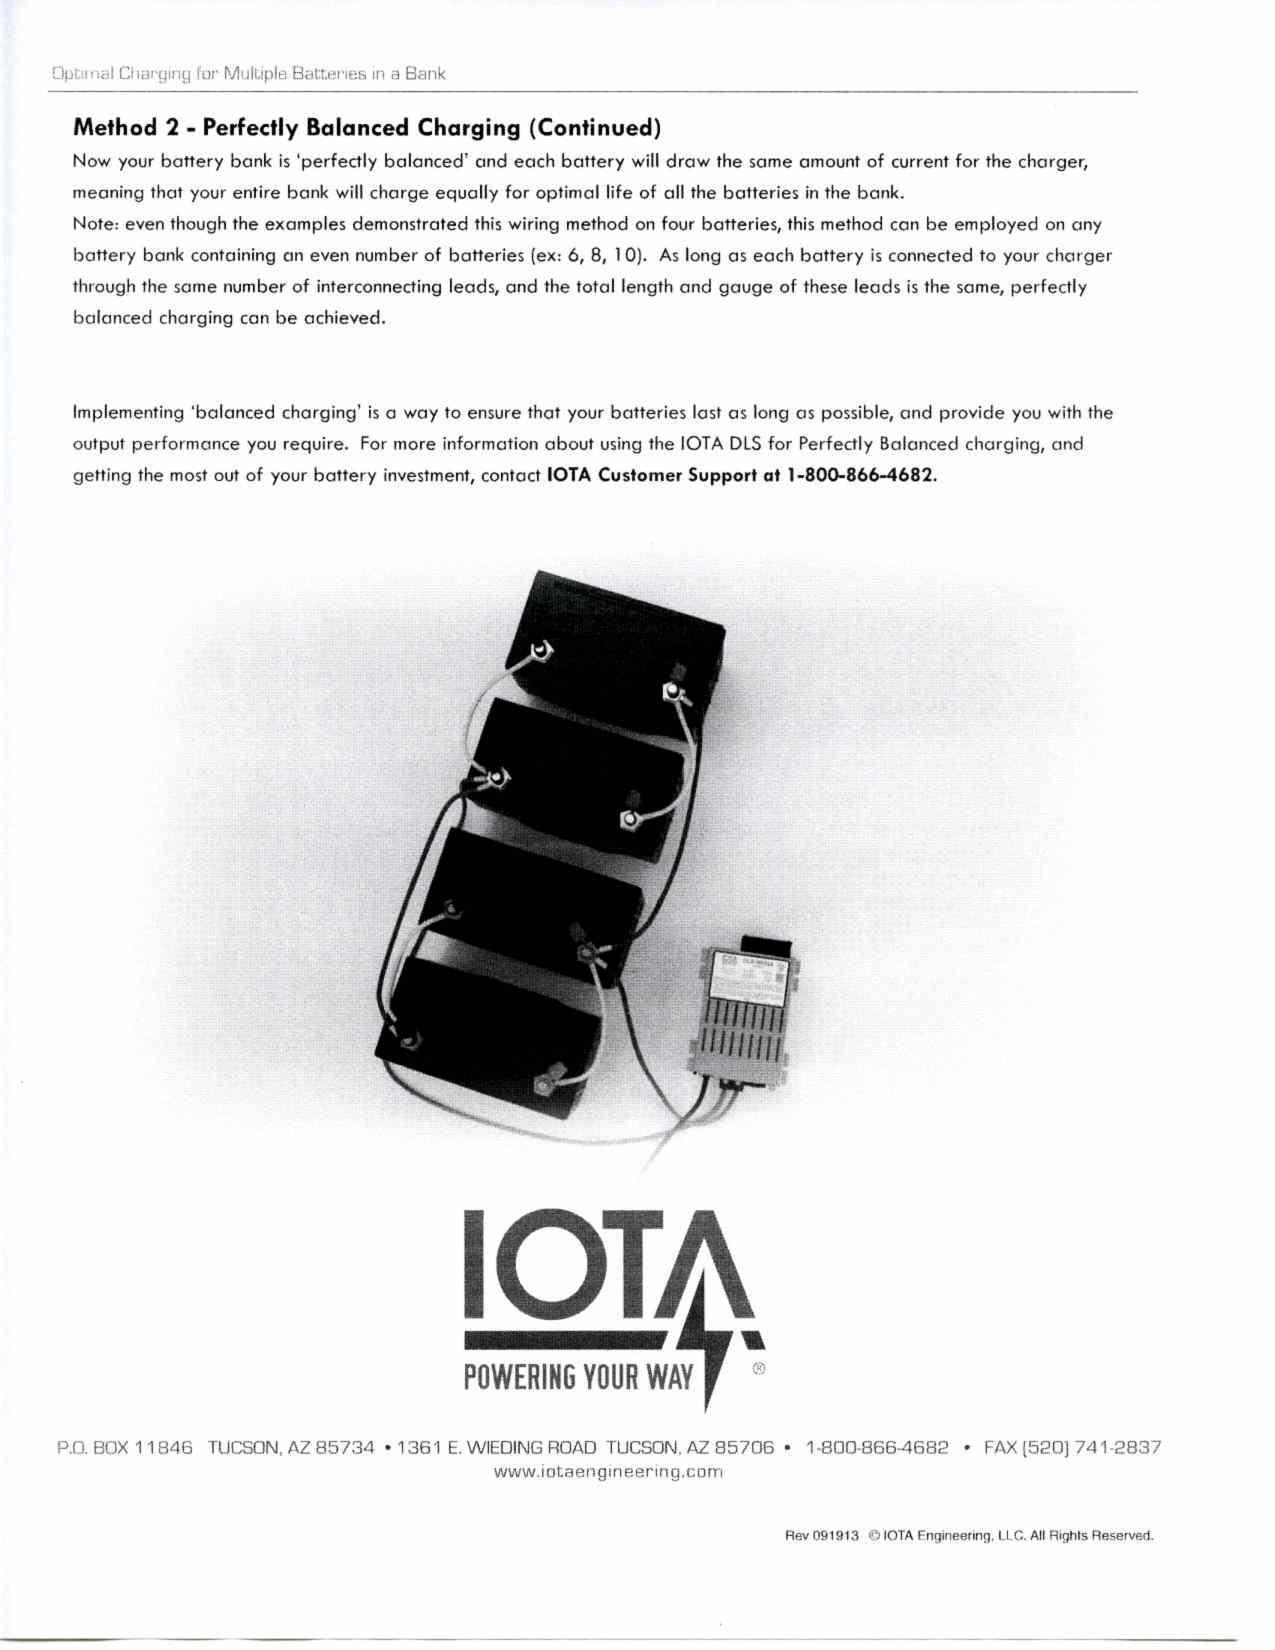 iota i 24 emergency ballast wiring diagram 2005 honda civic cooling system 80 42